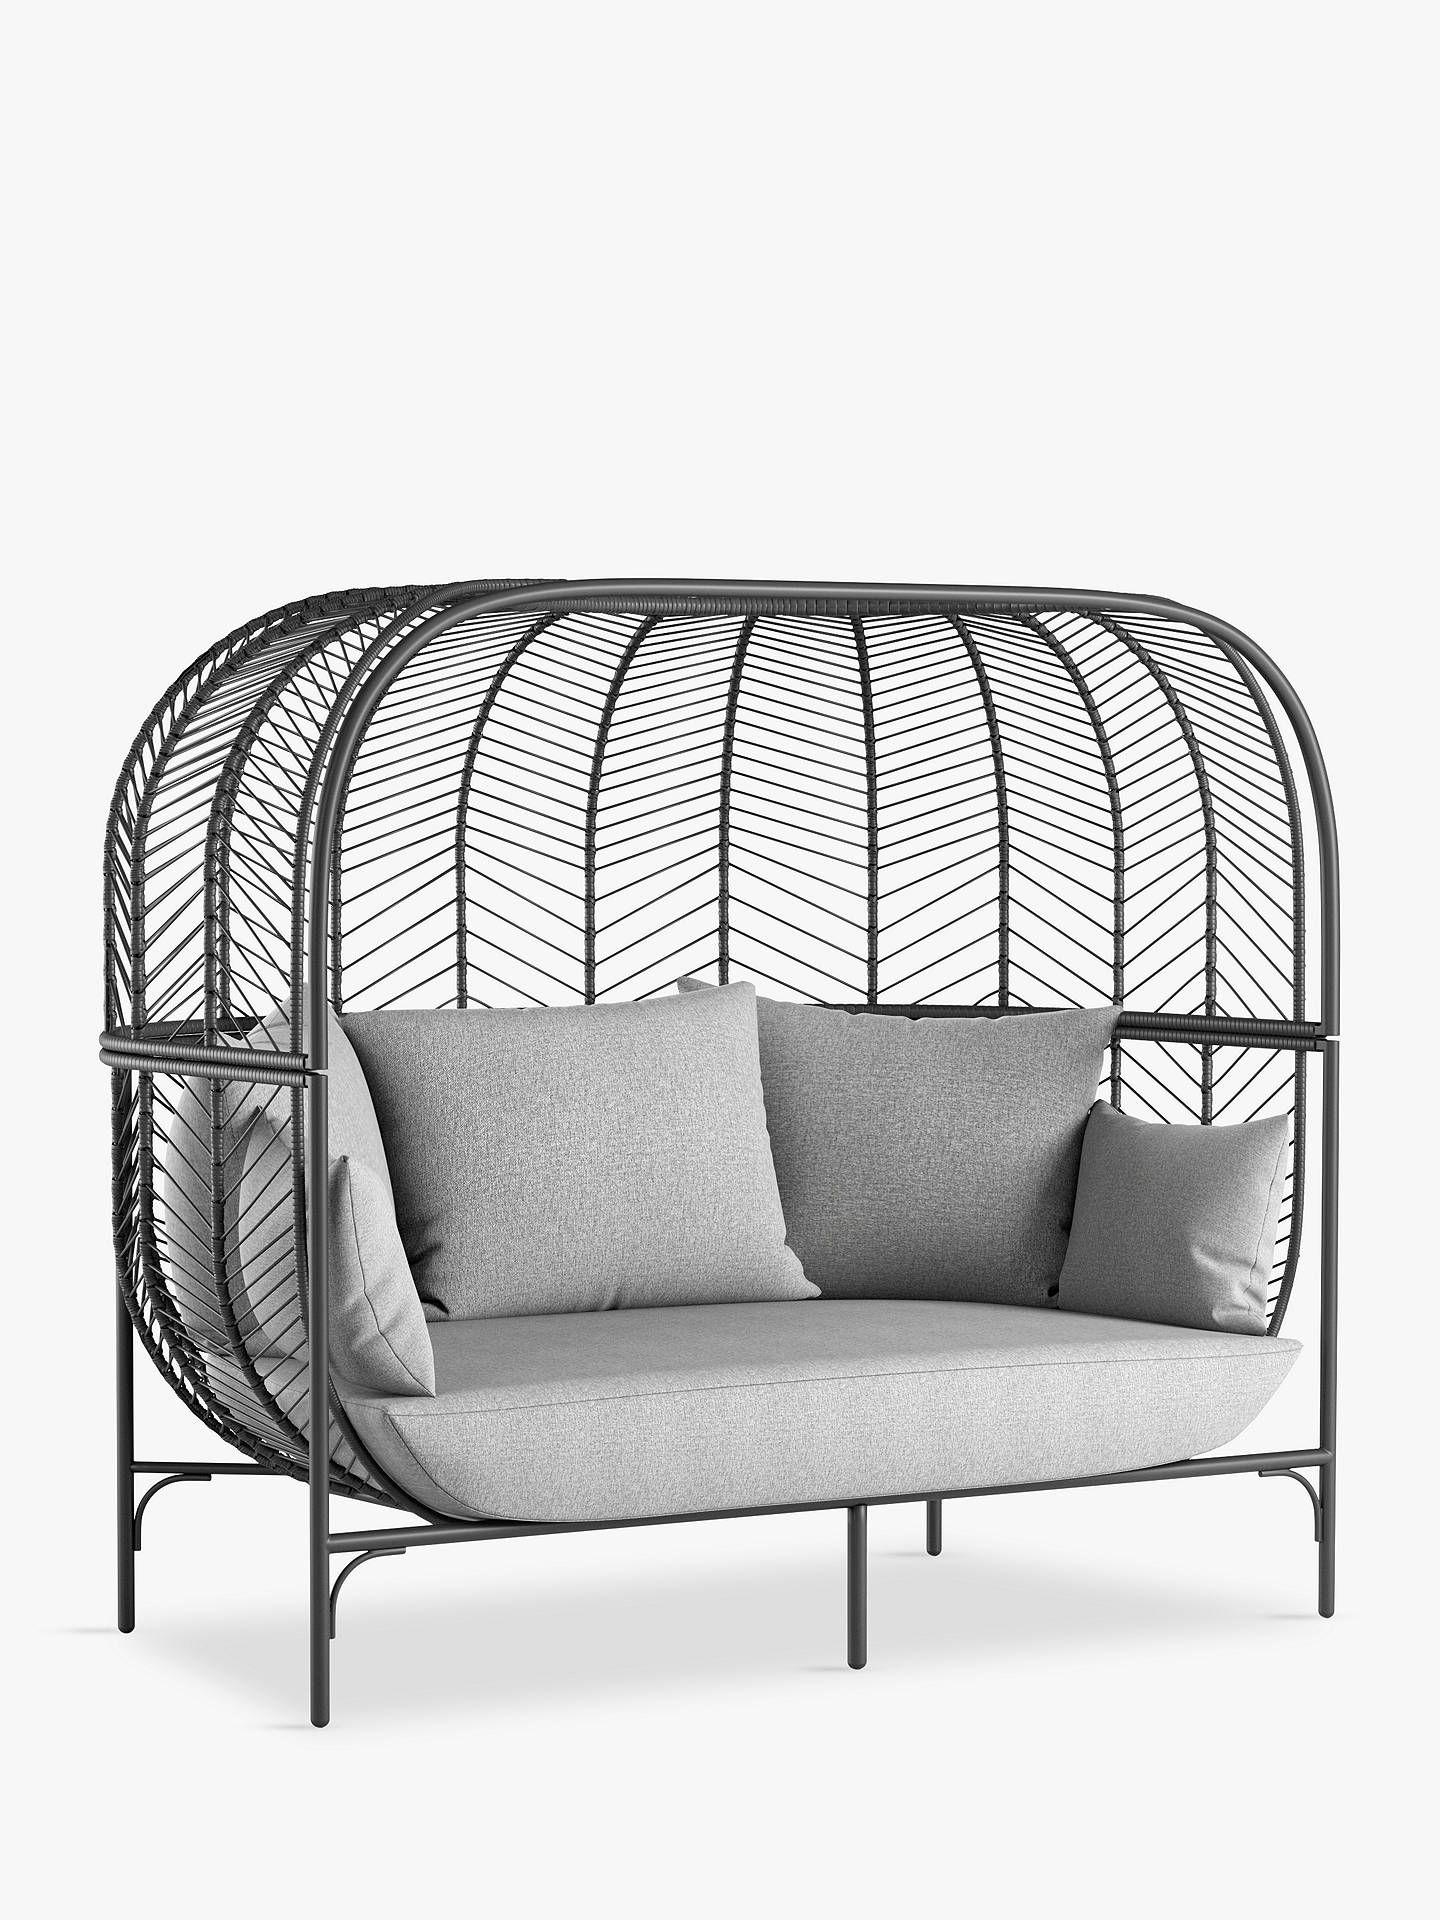 John Lewis & Partners Chevron 7-Seat Double Garden Sofa Pod, Black